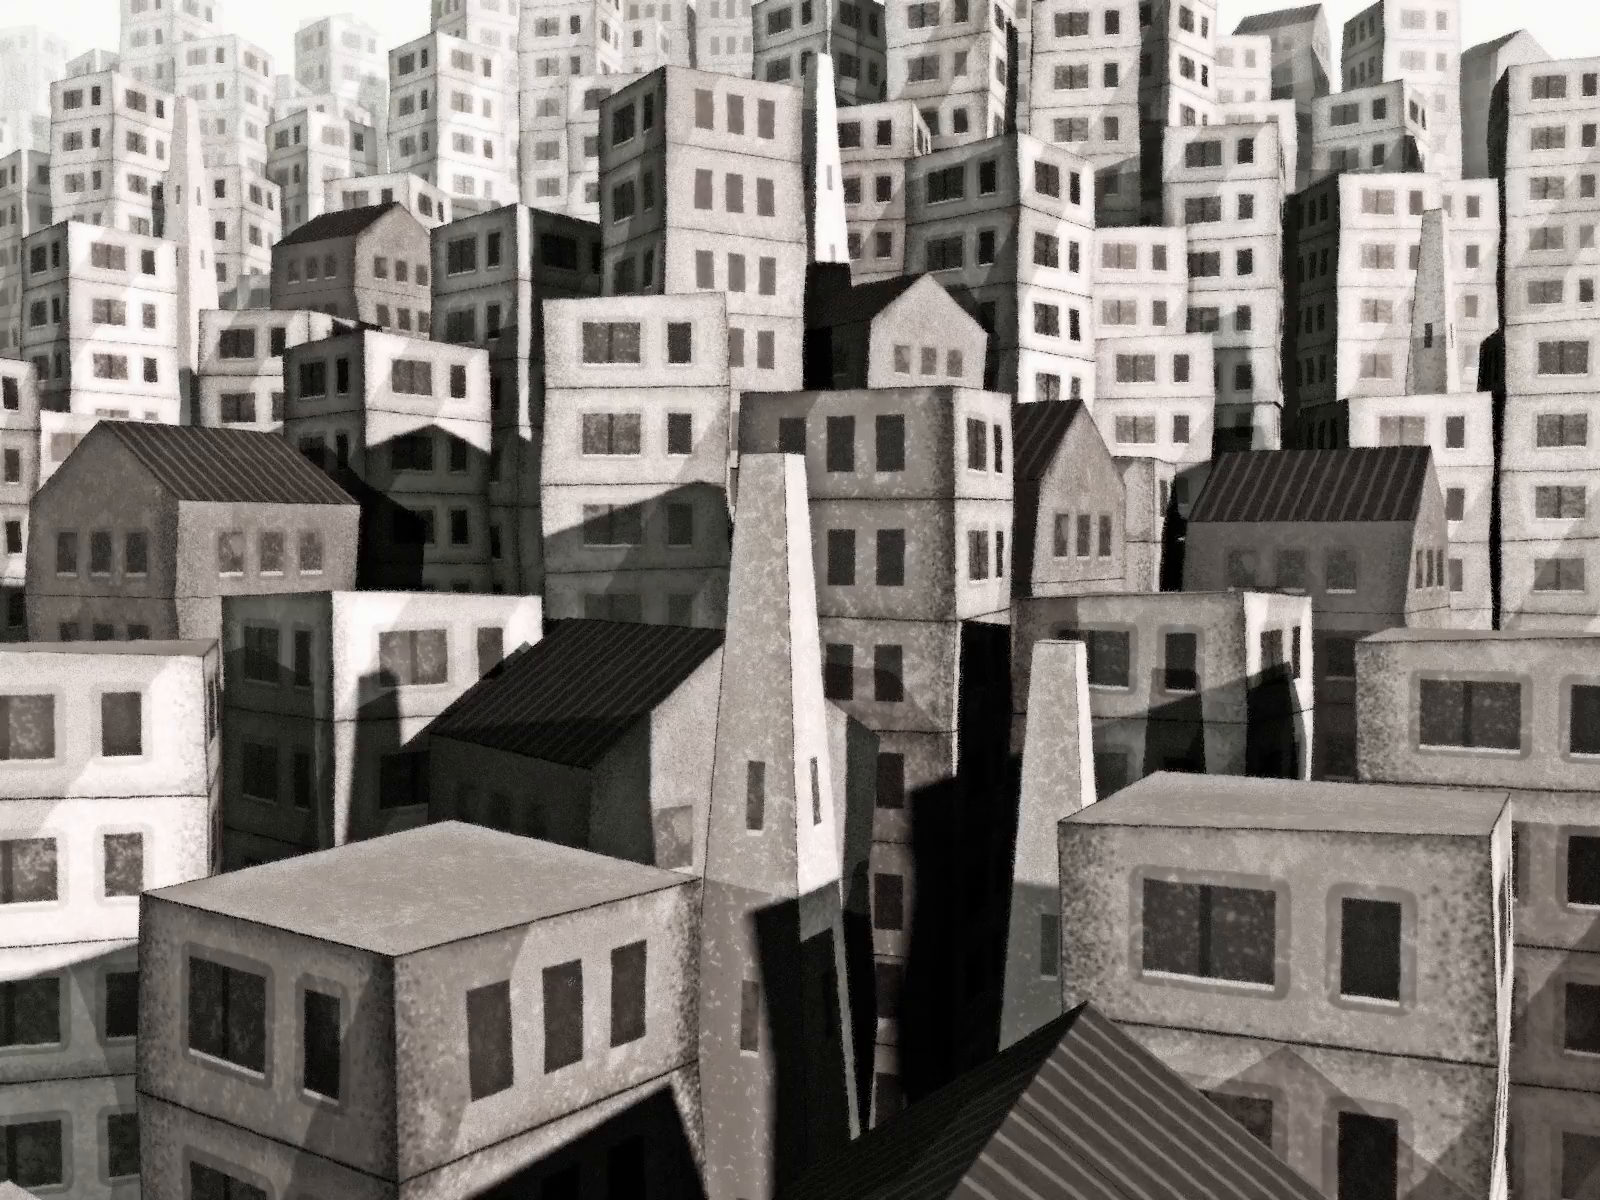 Unknown Village - Styleframe exploration